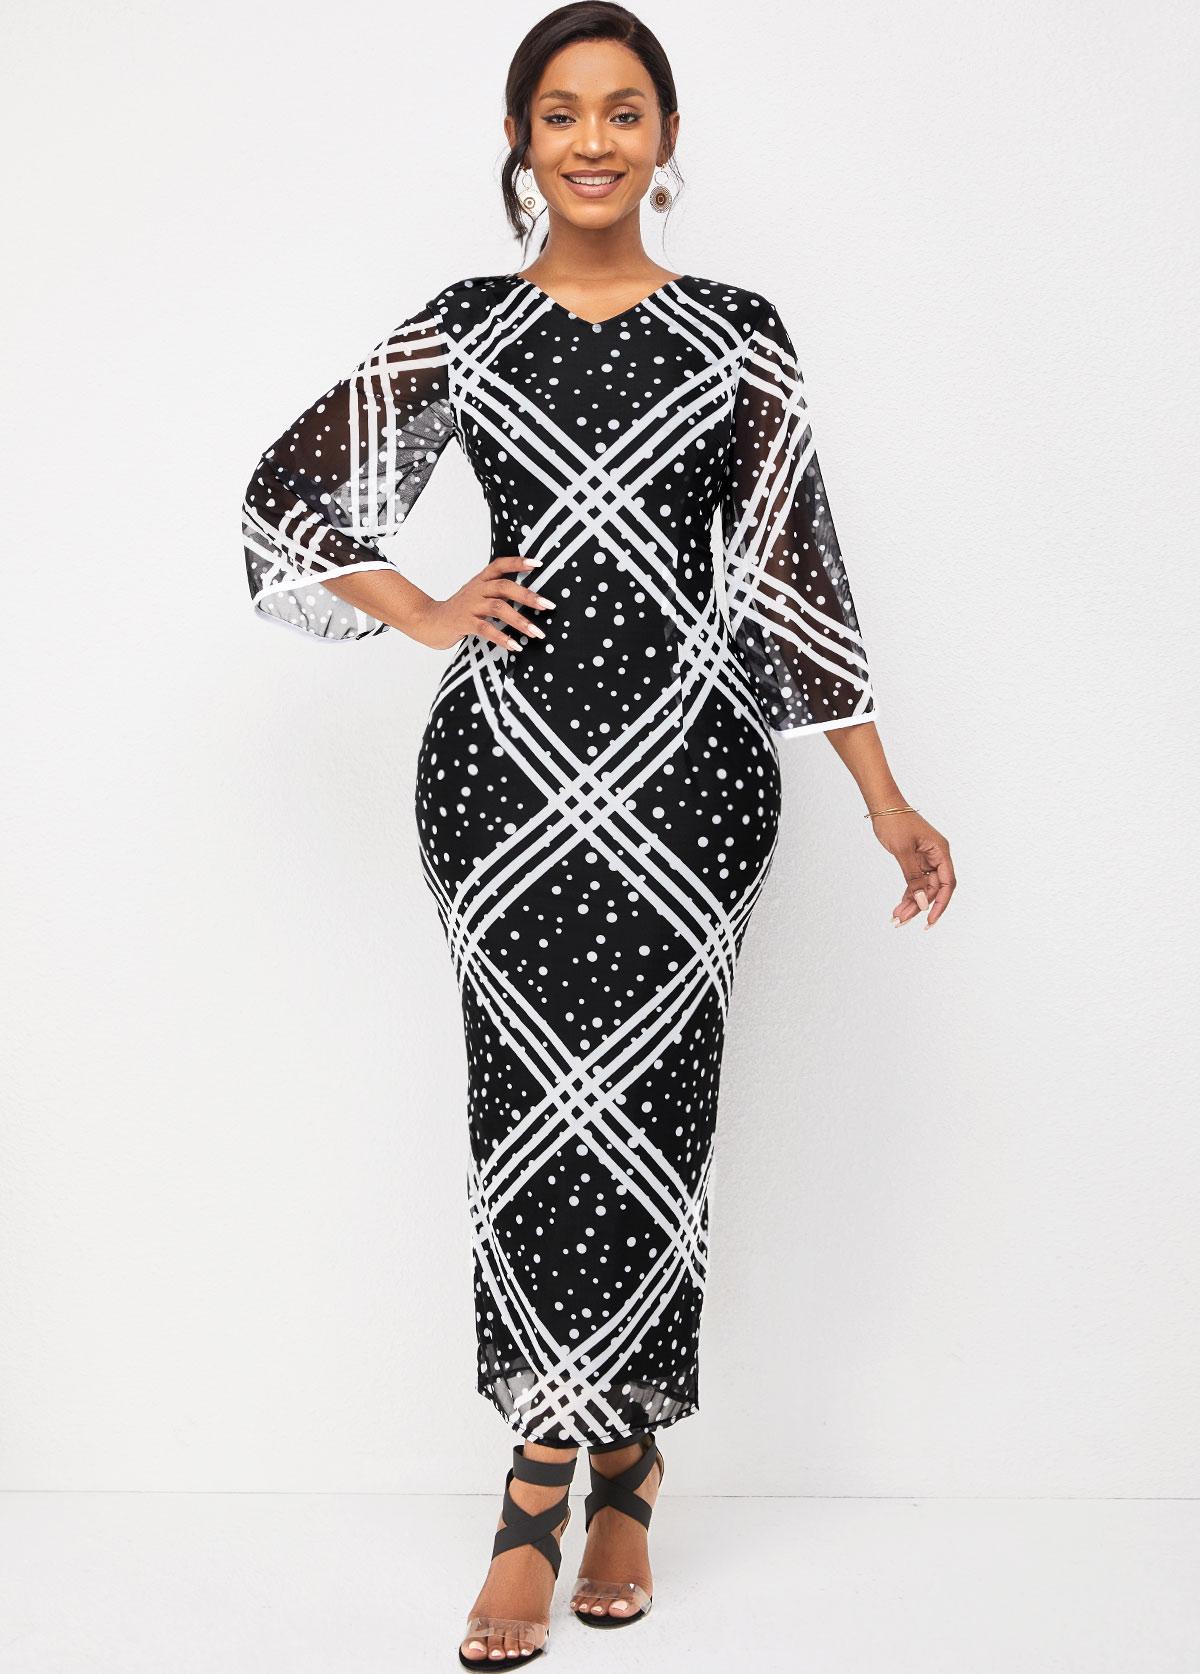 ROTITA Striped and Polka Dot V Neck Flare Sleeve Dress